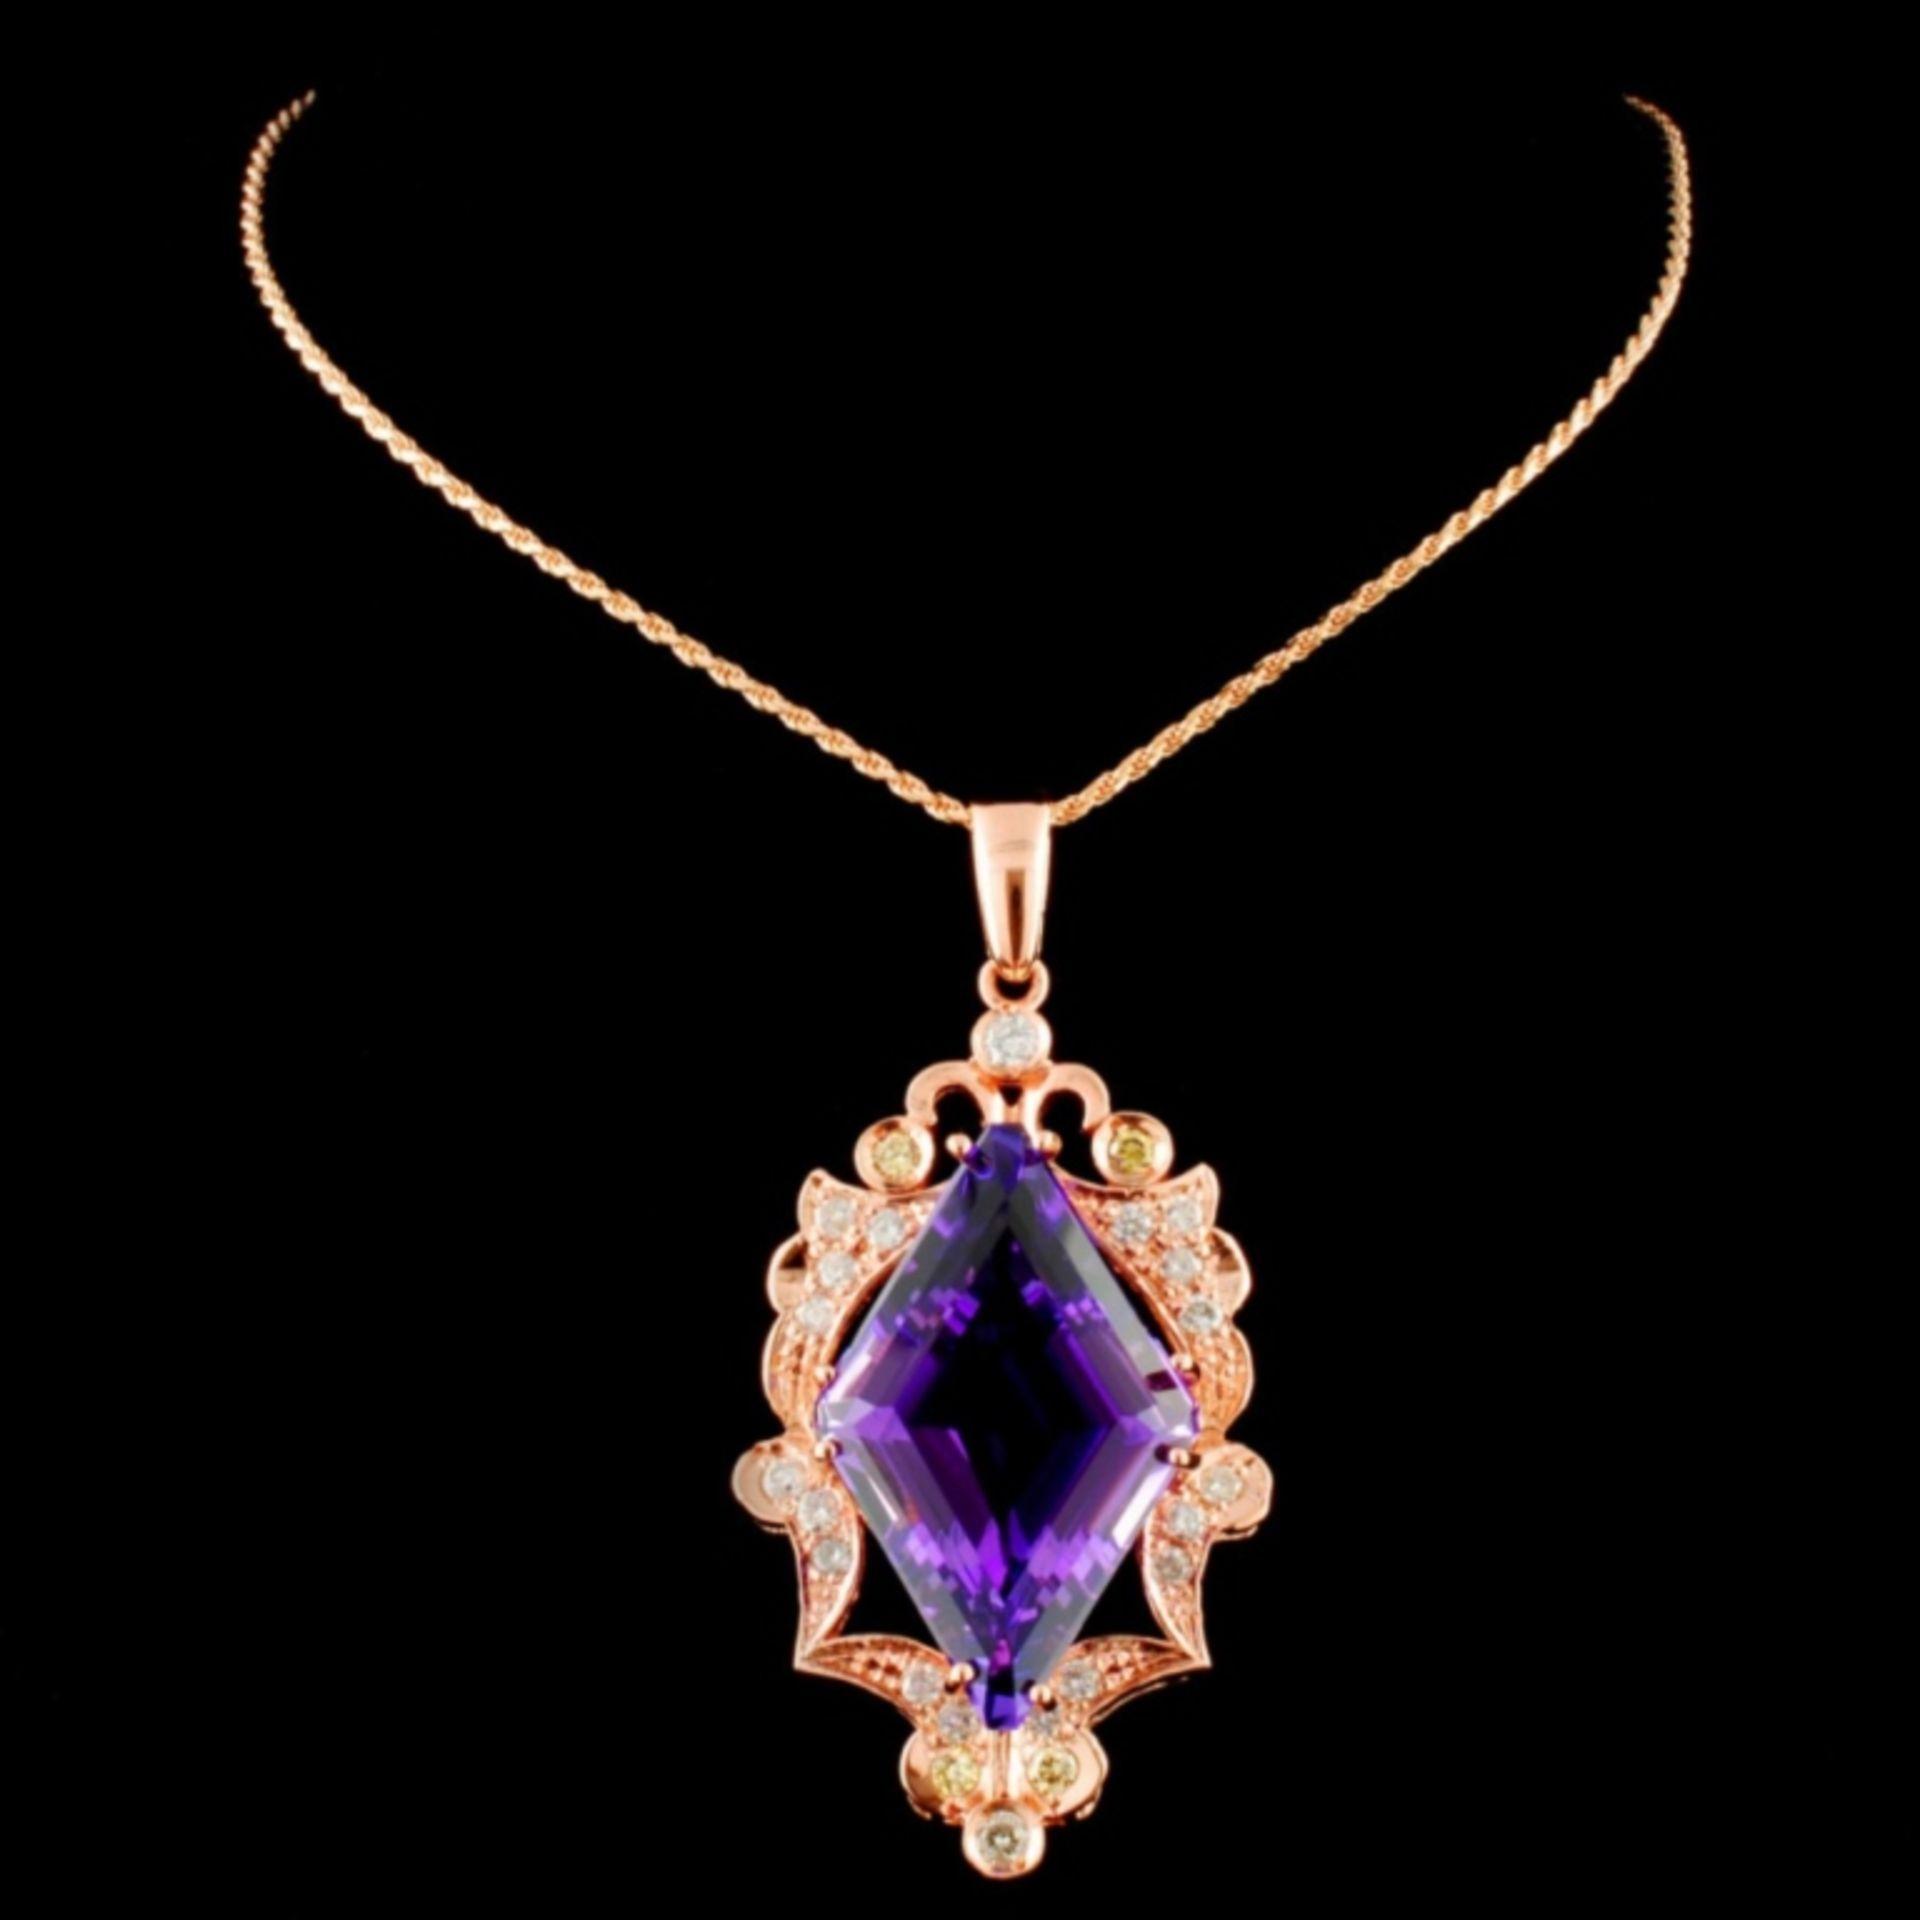 14K Gold 16.61ct Amethyst & 1.00ctw Diamond Pendan - Image 2 of 3